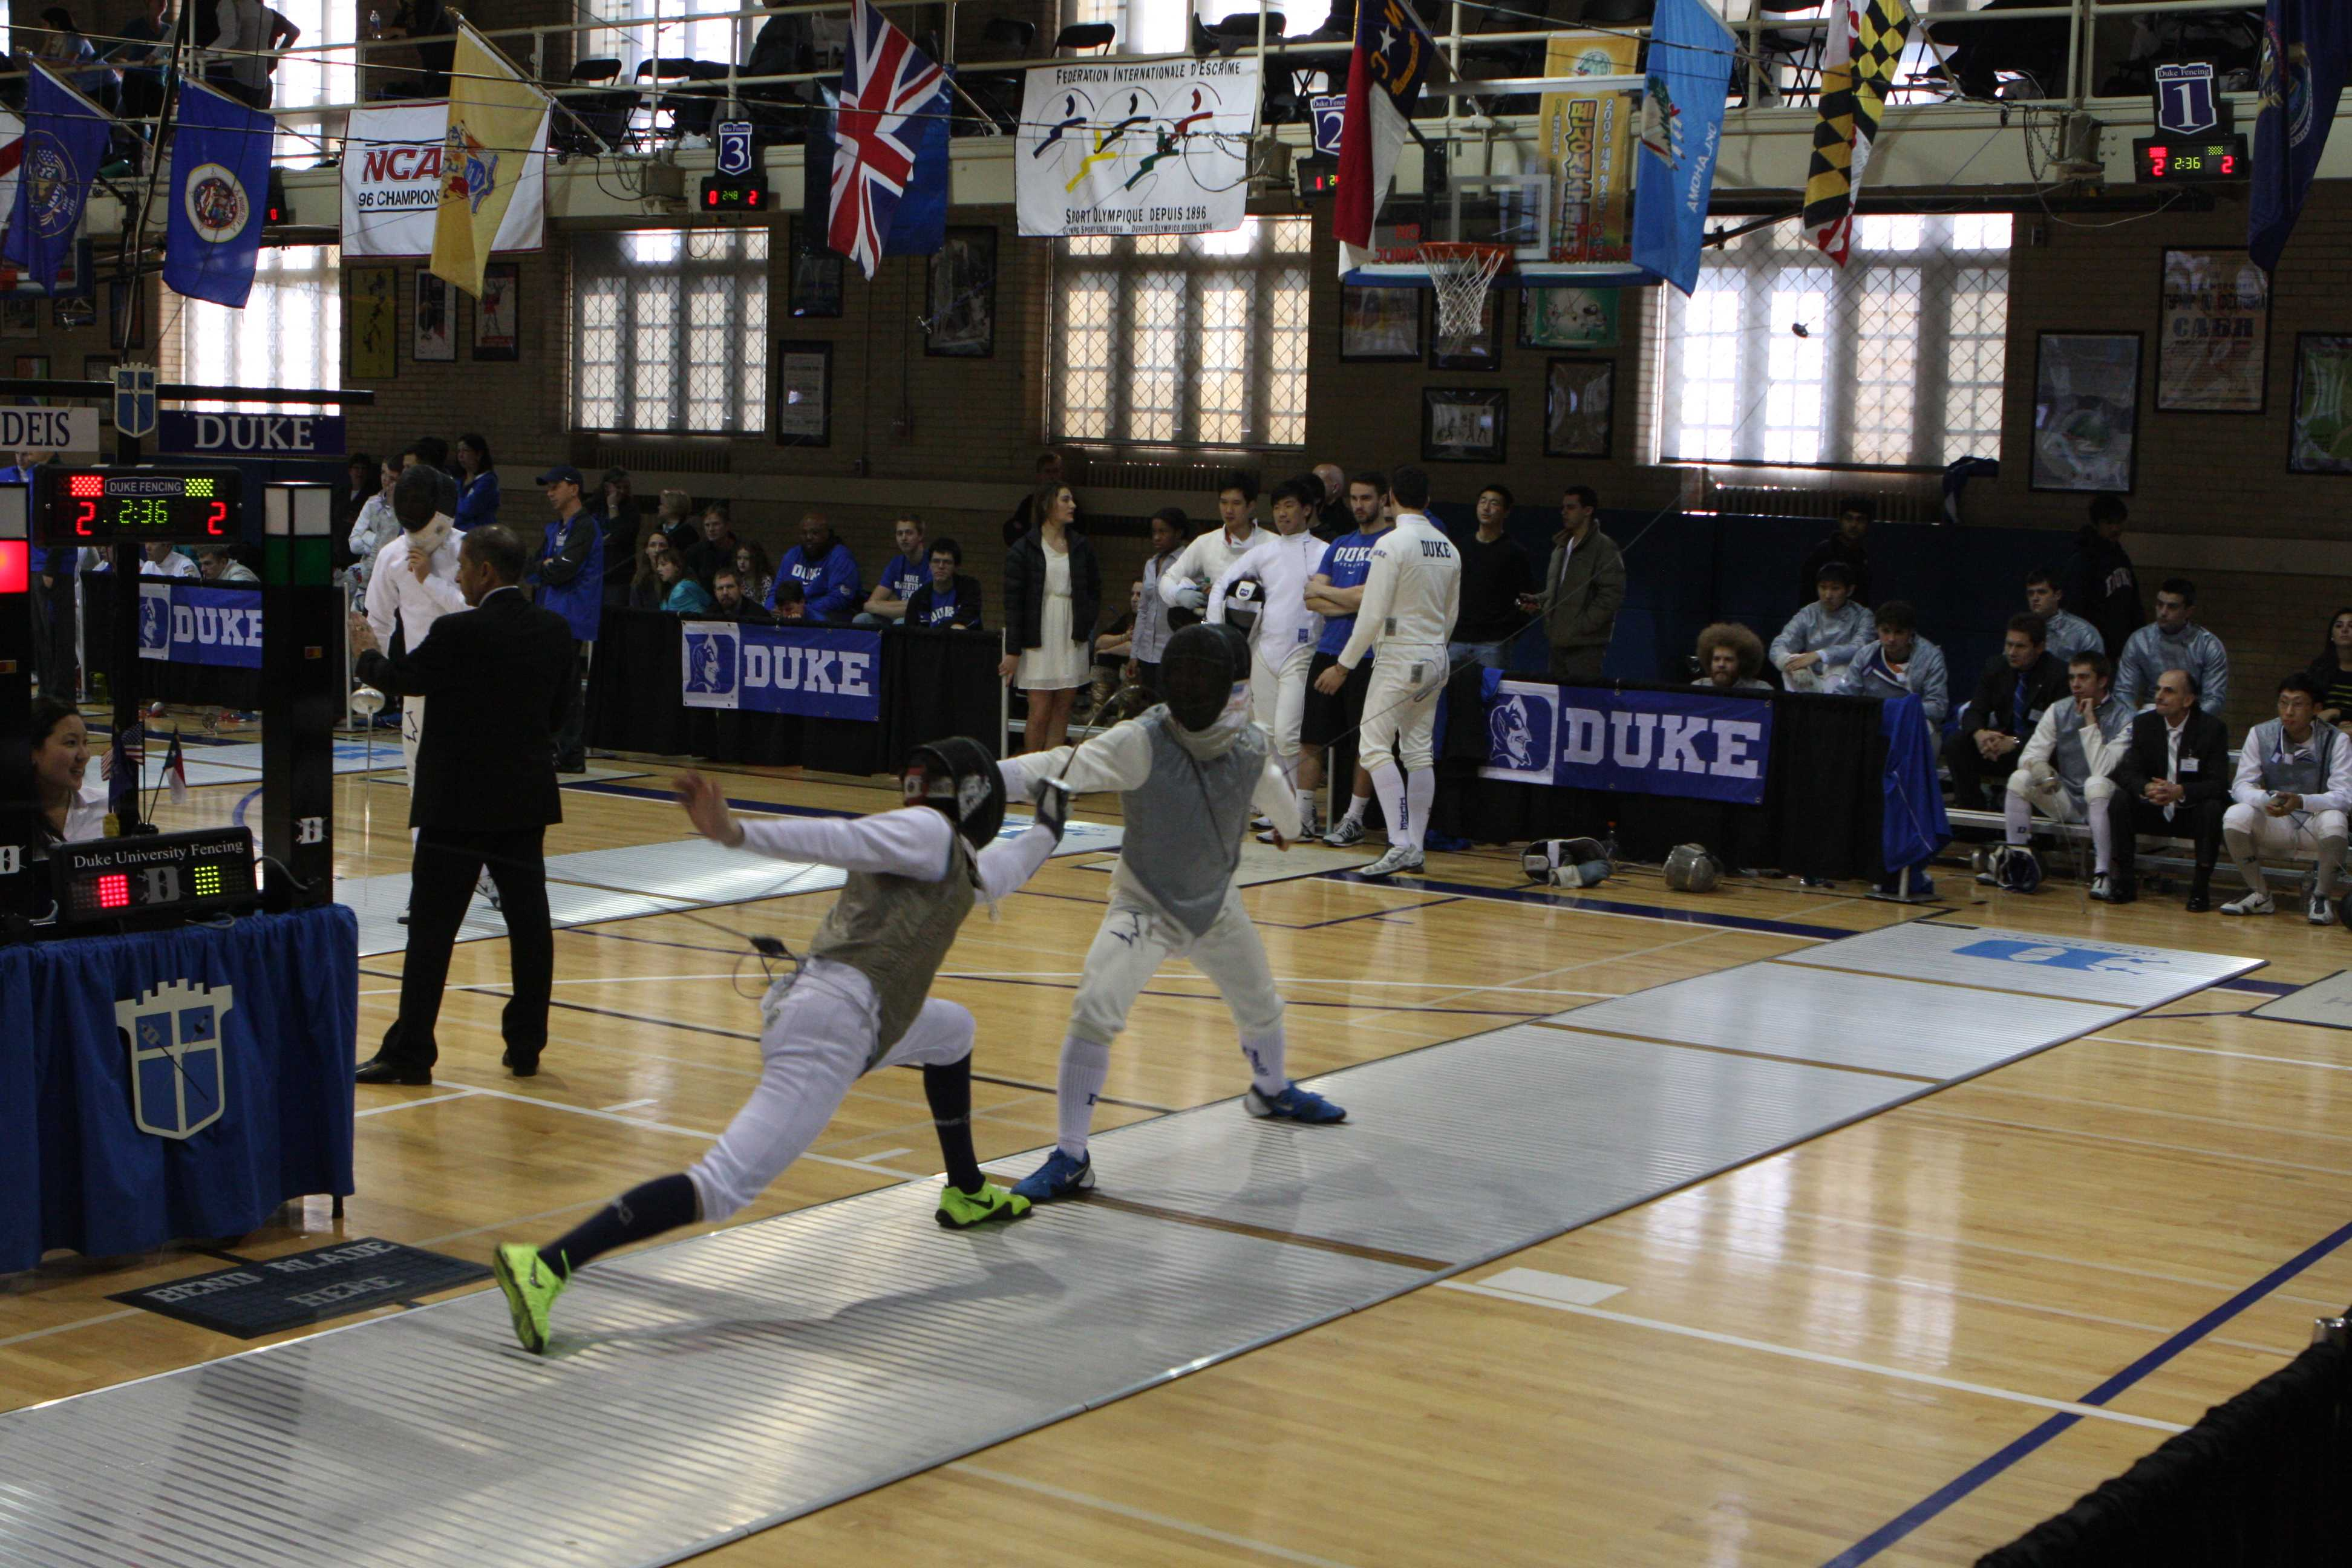 Noah Berman won a duel against an opponent from Duke University. Photo by Steven Berman.